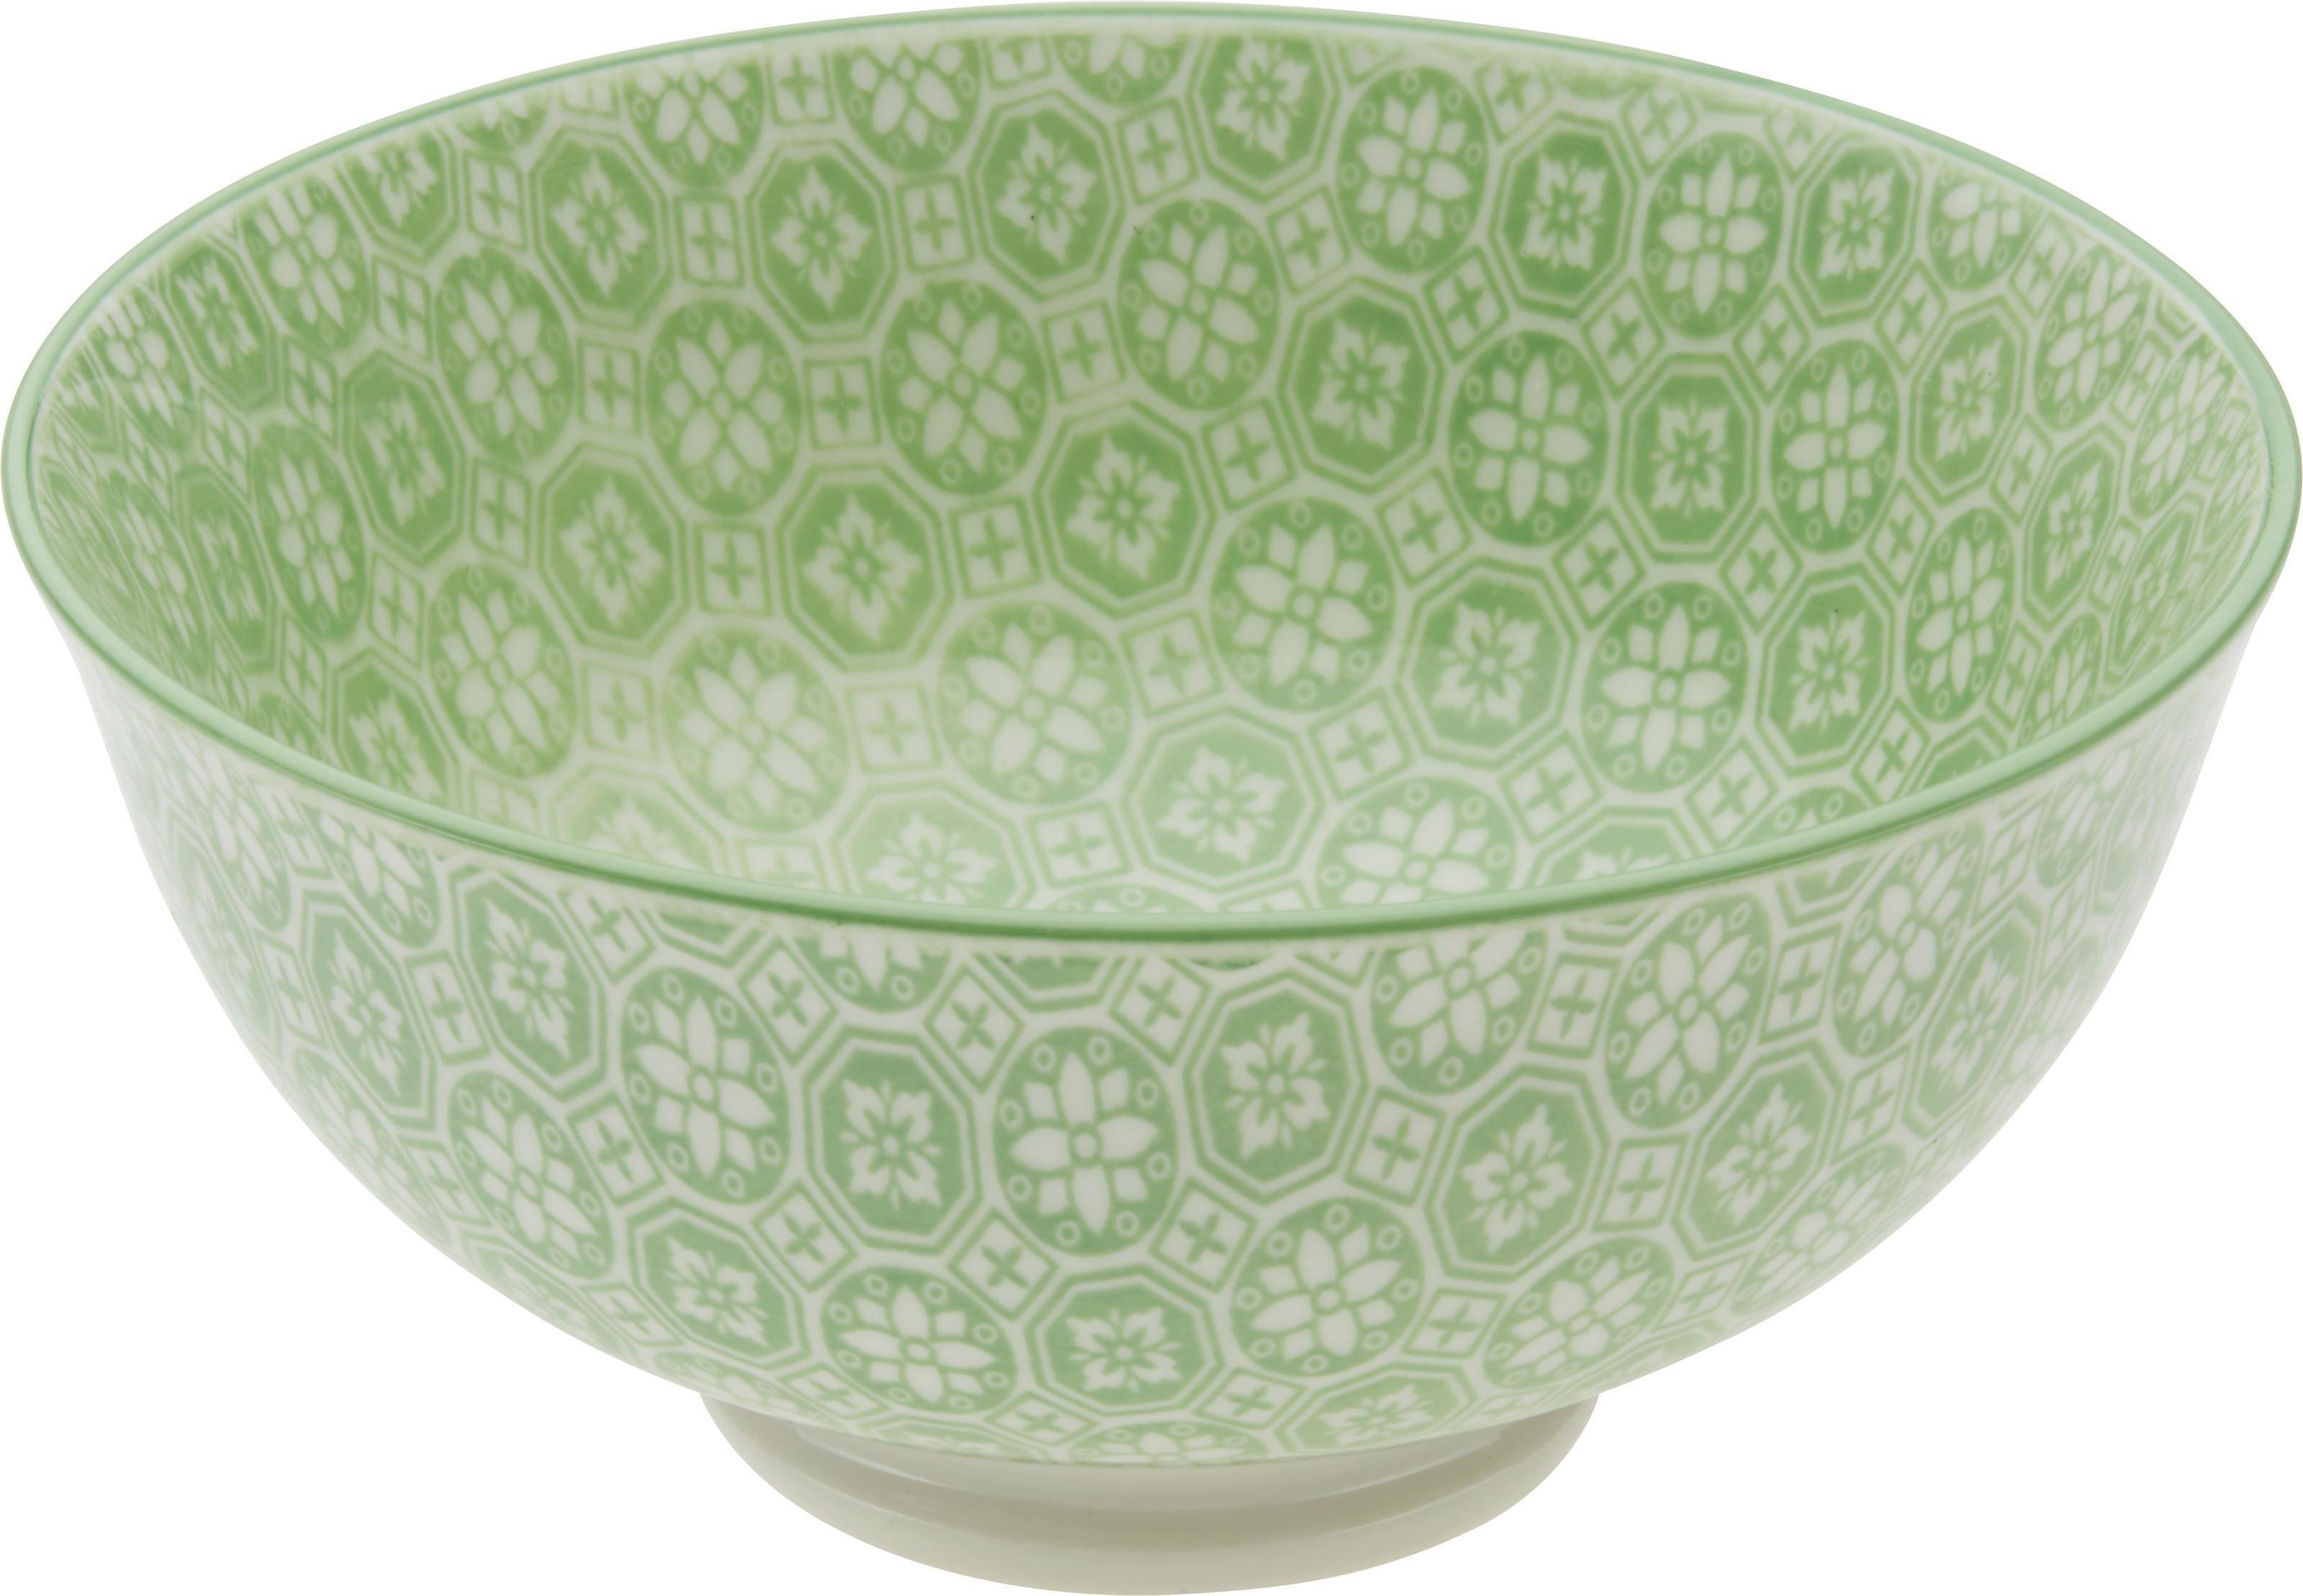 Schale Shakti aus Porzellan - Multicolor, LIFESTYLE, Keramik (11,5/5,8cm) - MÖMAX modern living